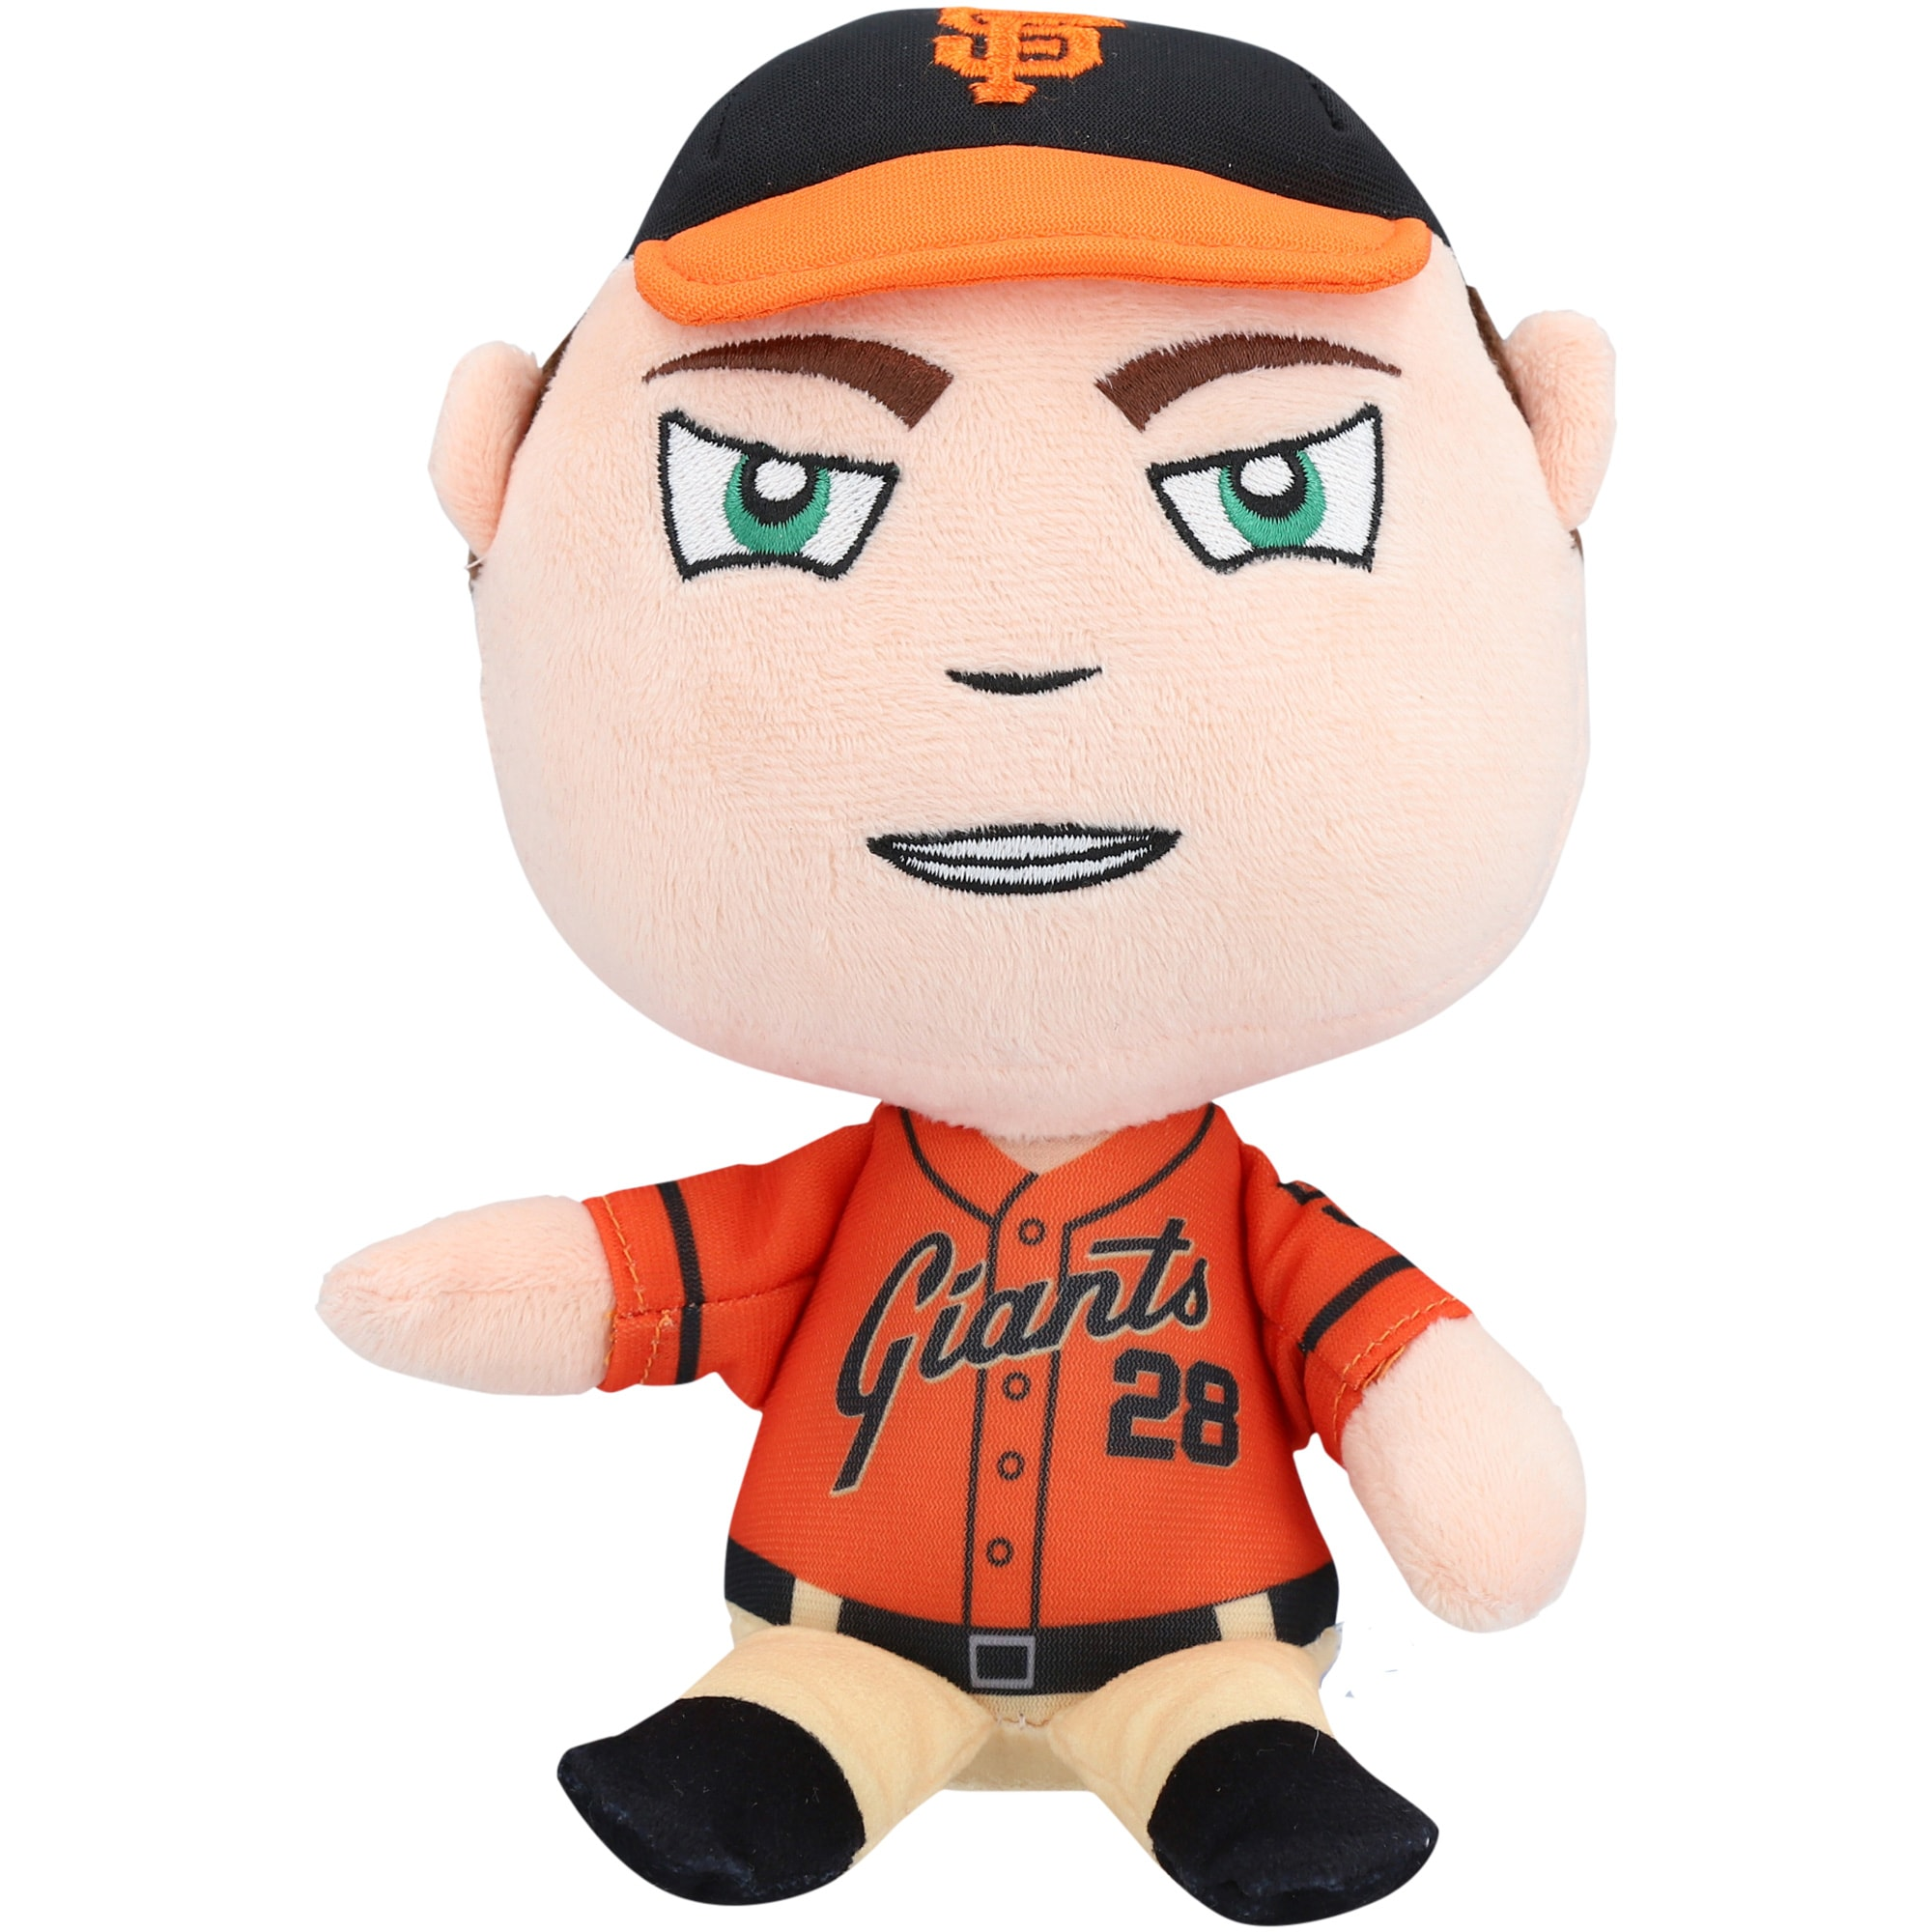 Buster Posey San Francisco Giants FOCO Baby Bros Plush Toy